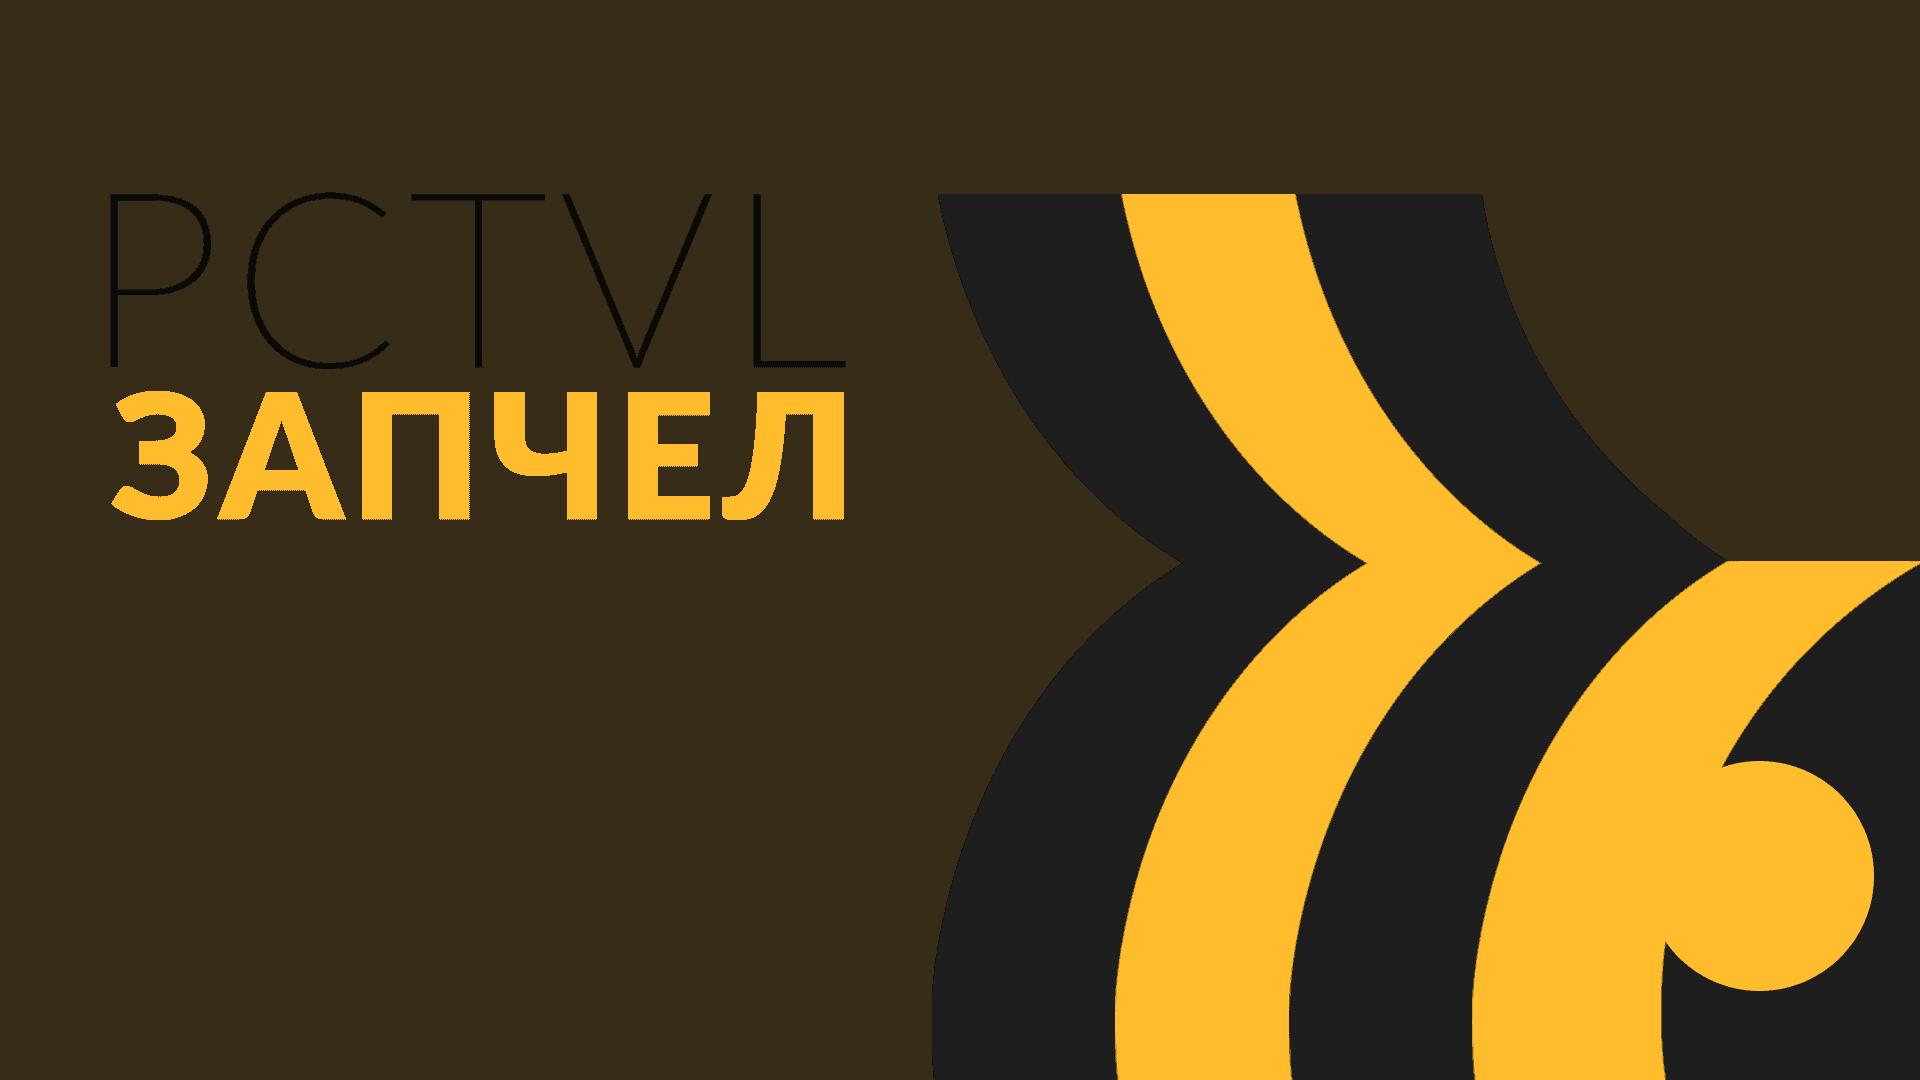 PCTVL